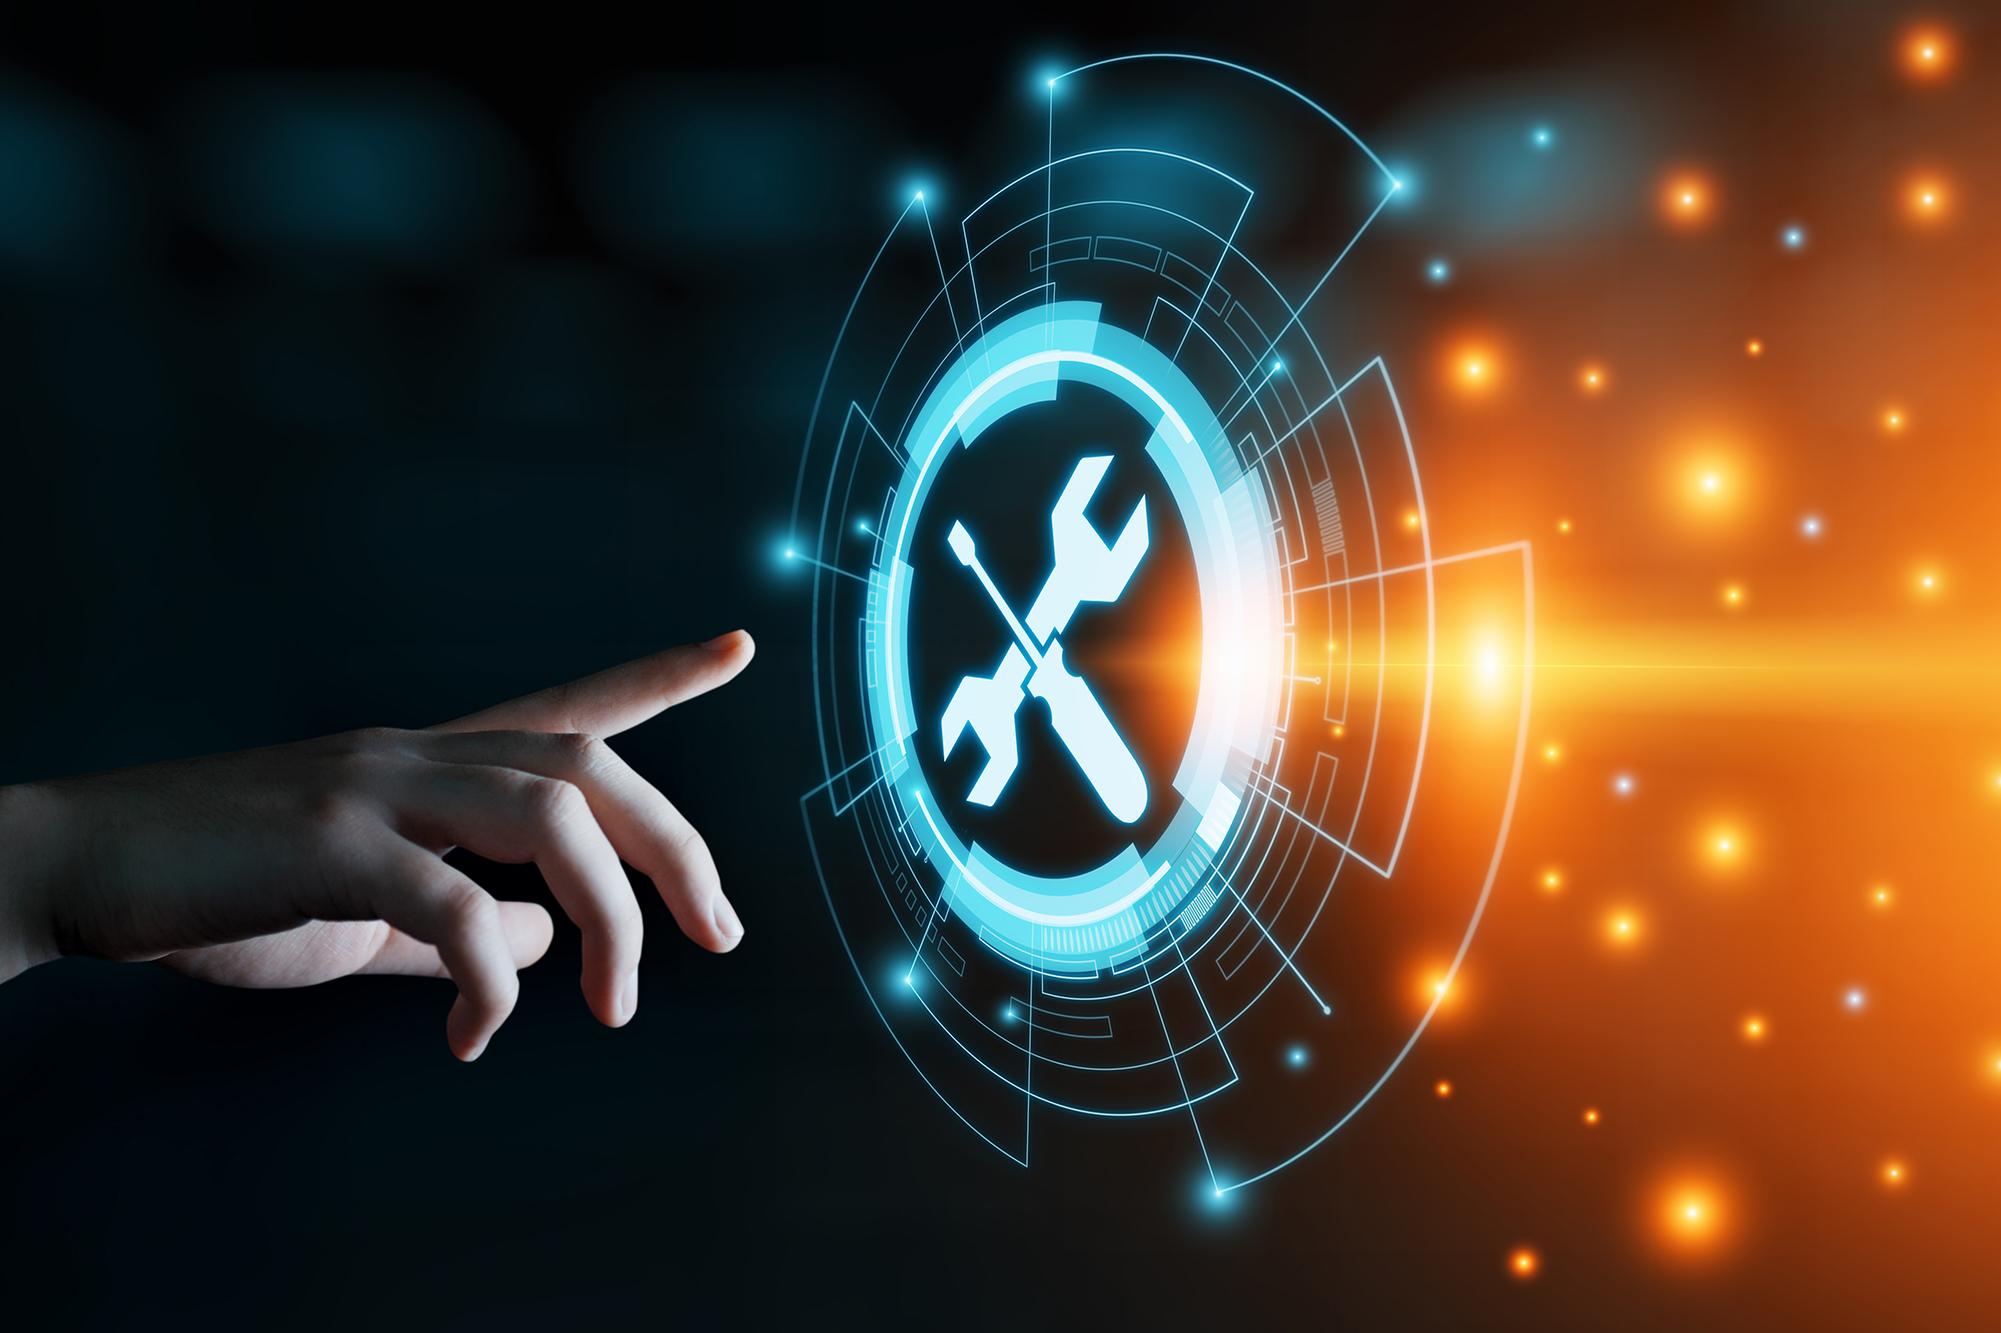 Nuvem Cloud Solutions: AWS Automation & DevOps - DevOps Tooling & Technologies